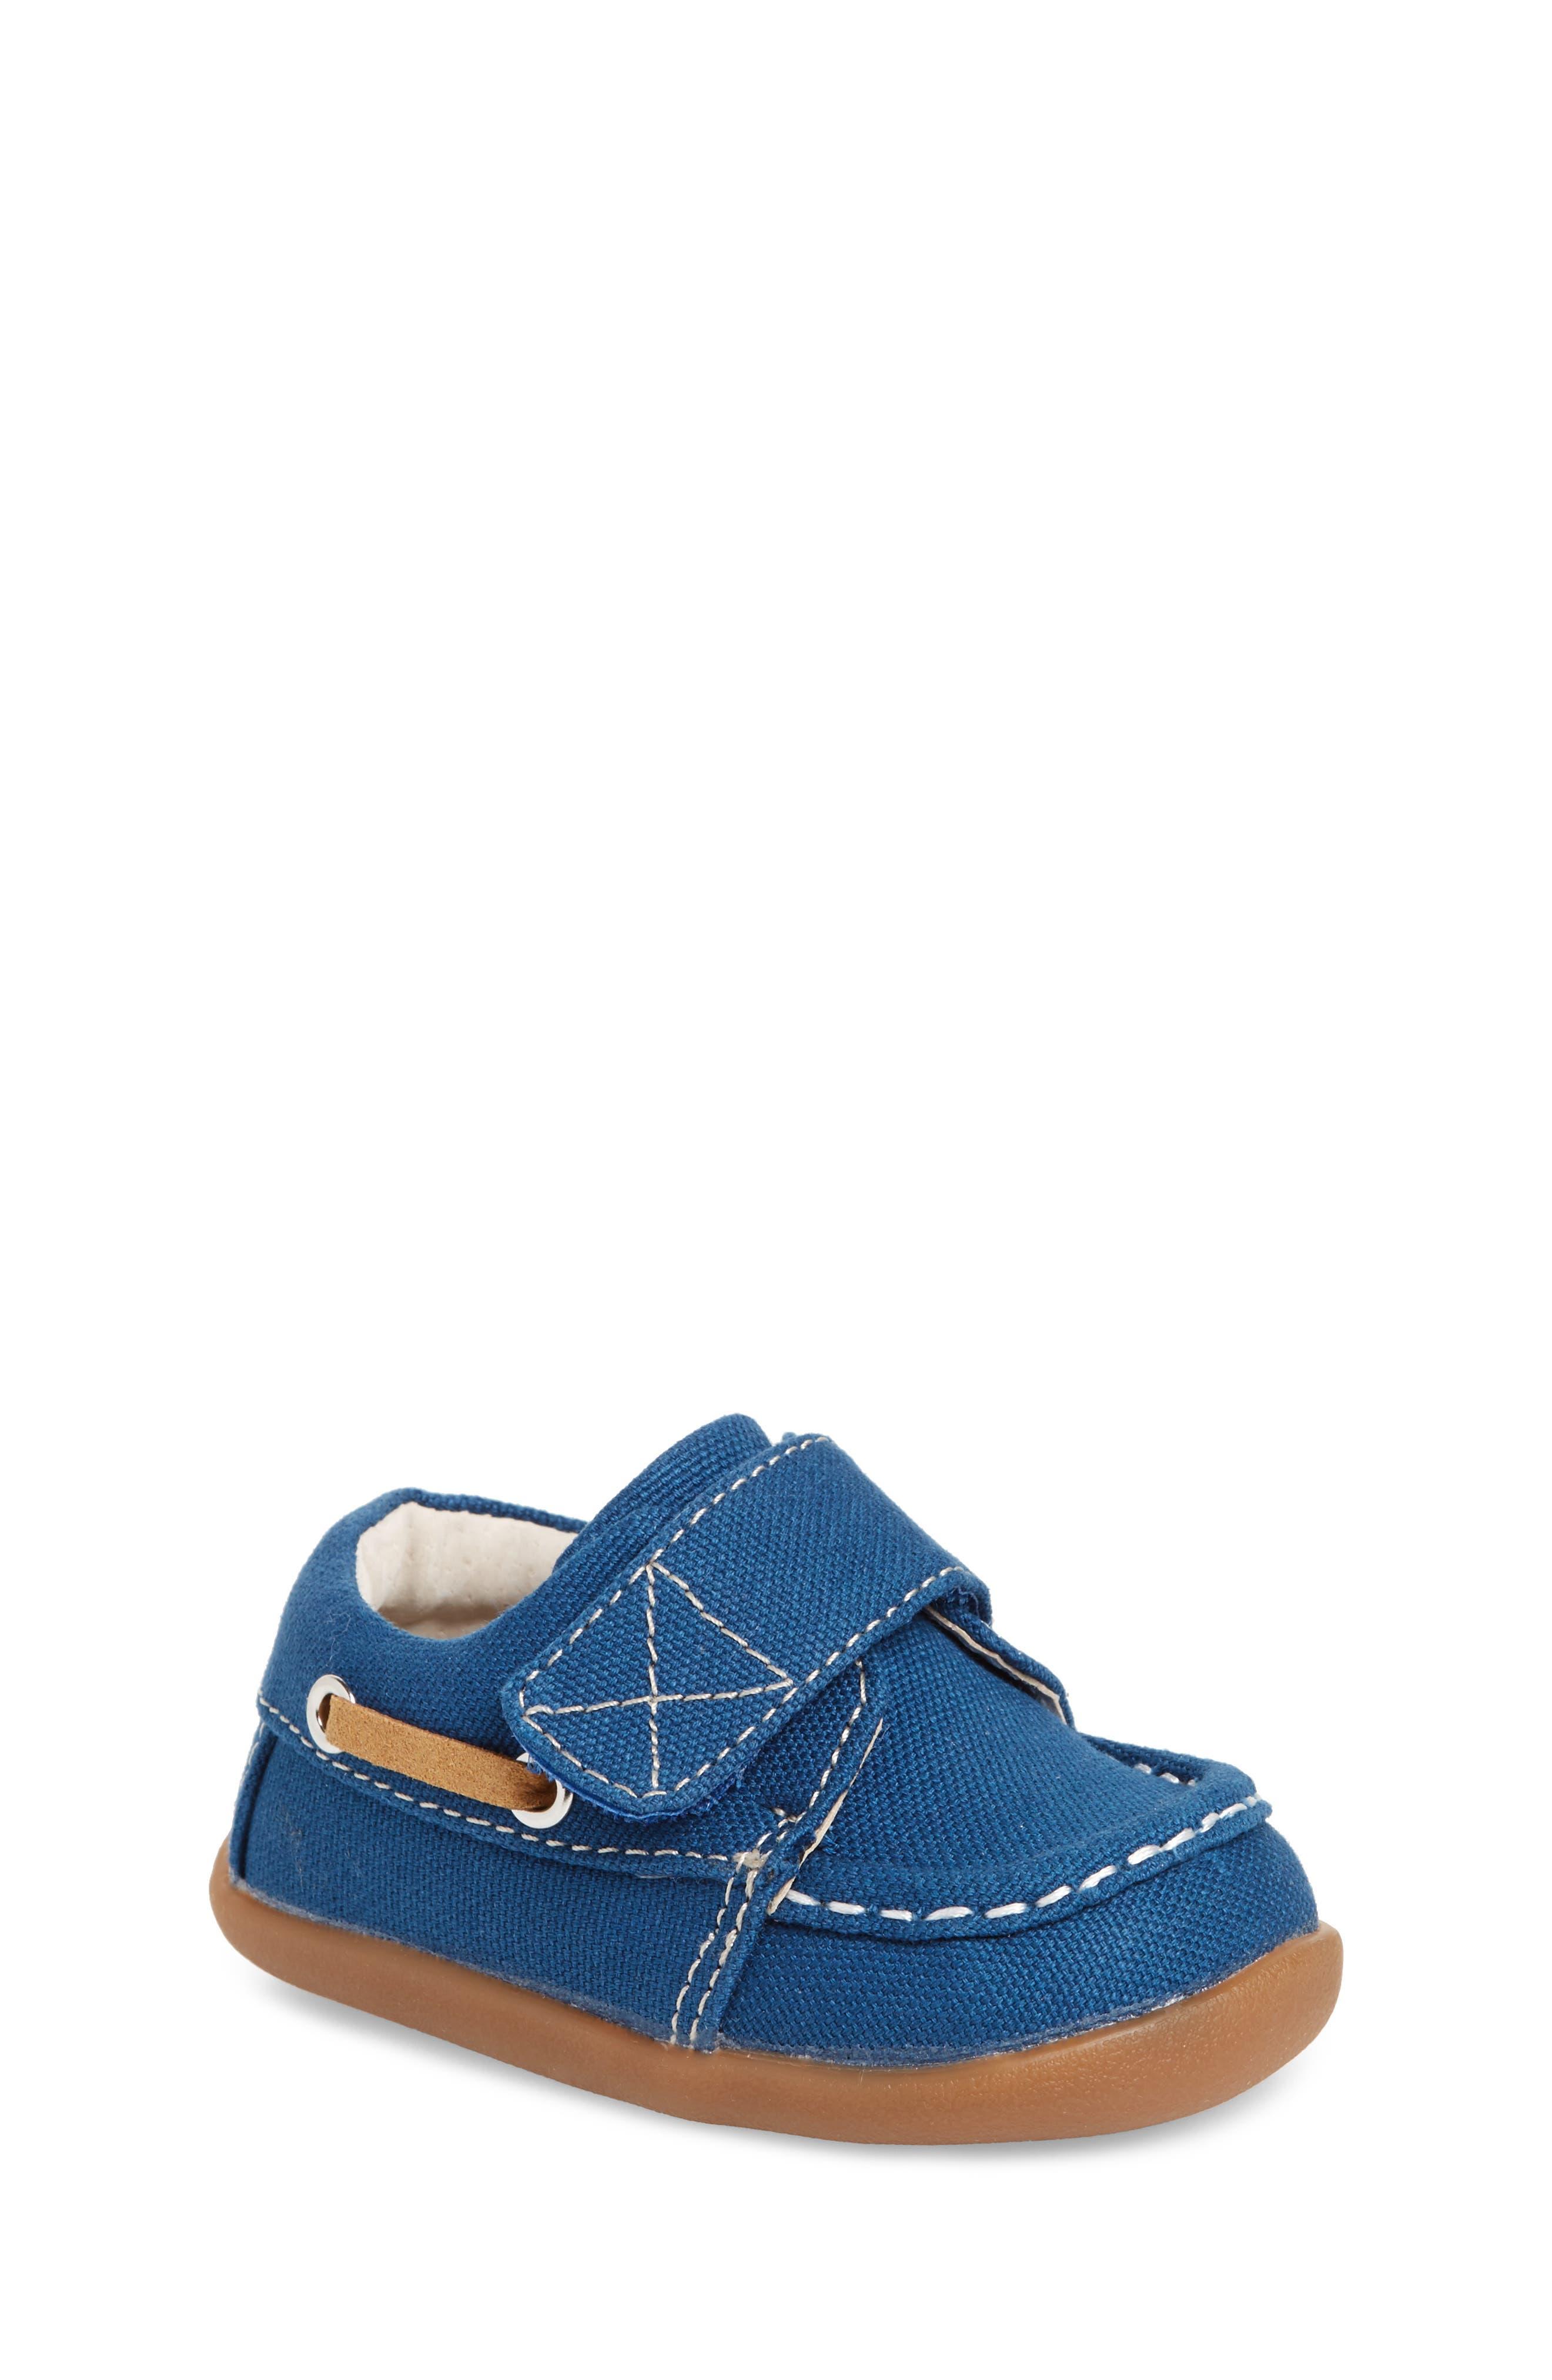 See Kai Run Arthur Sneaker (Baby & Walker)